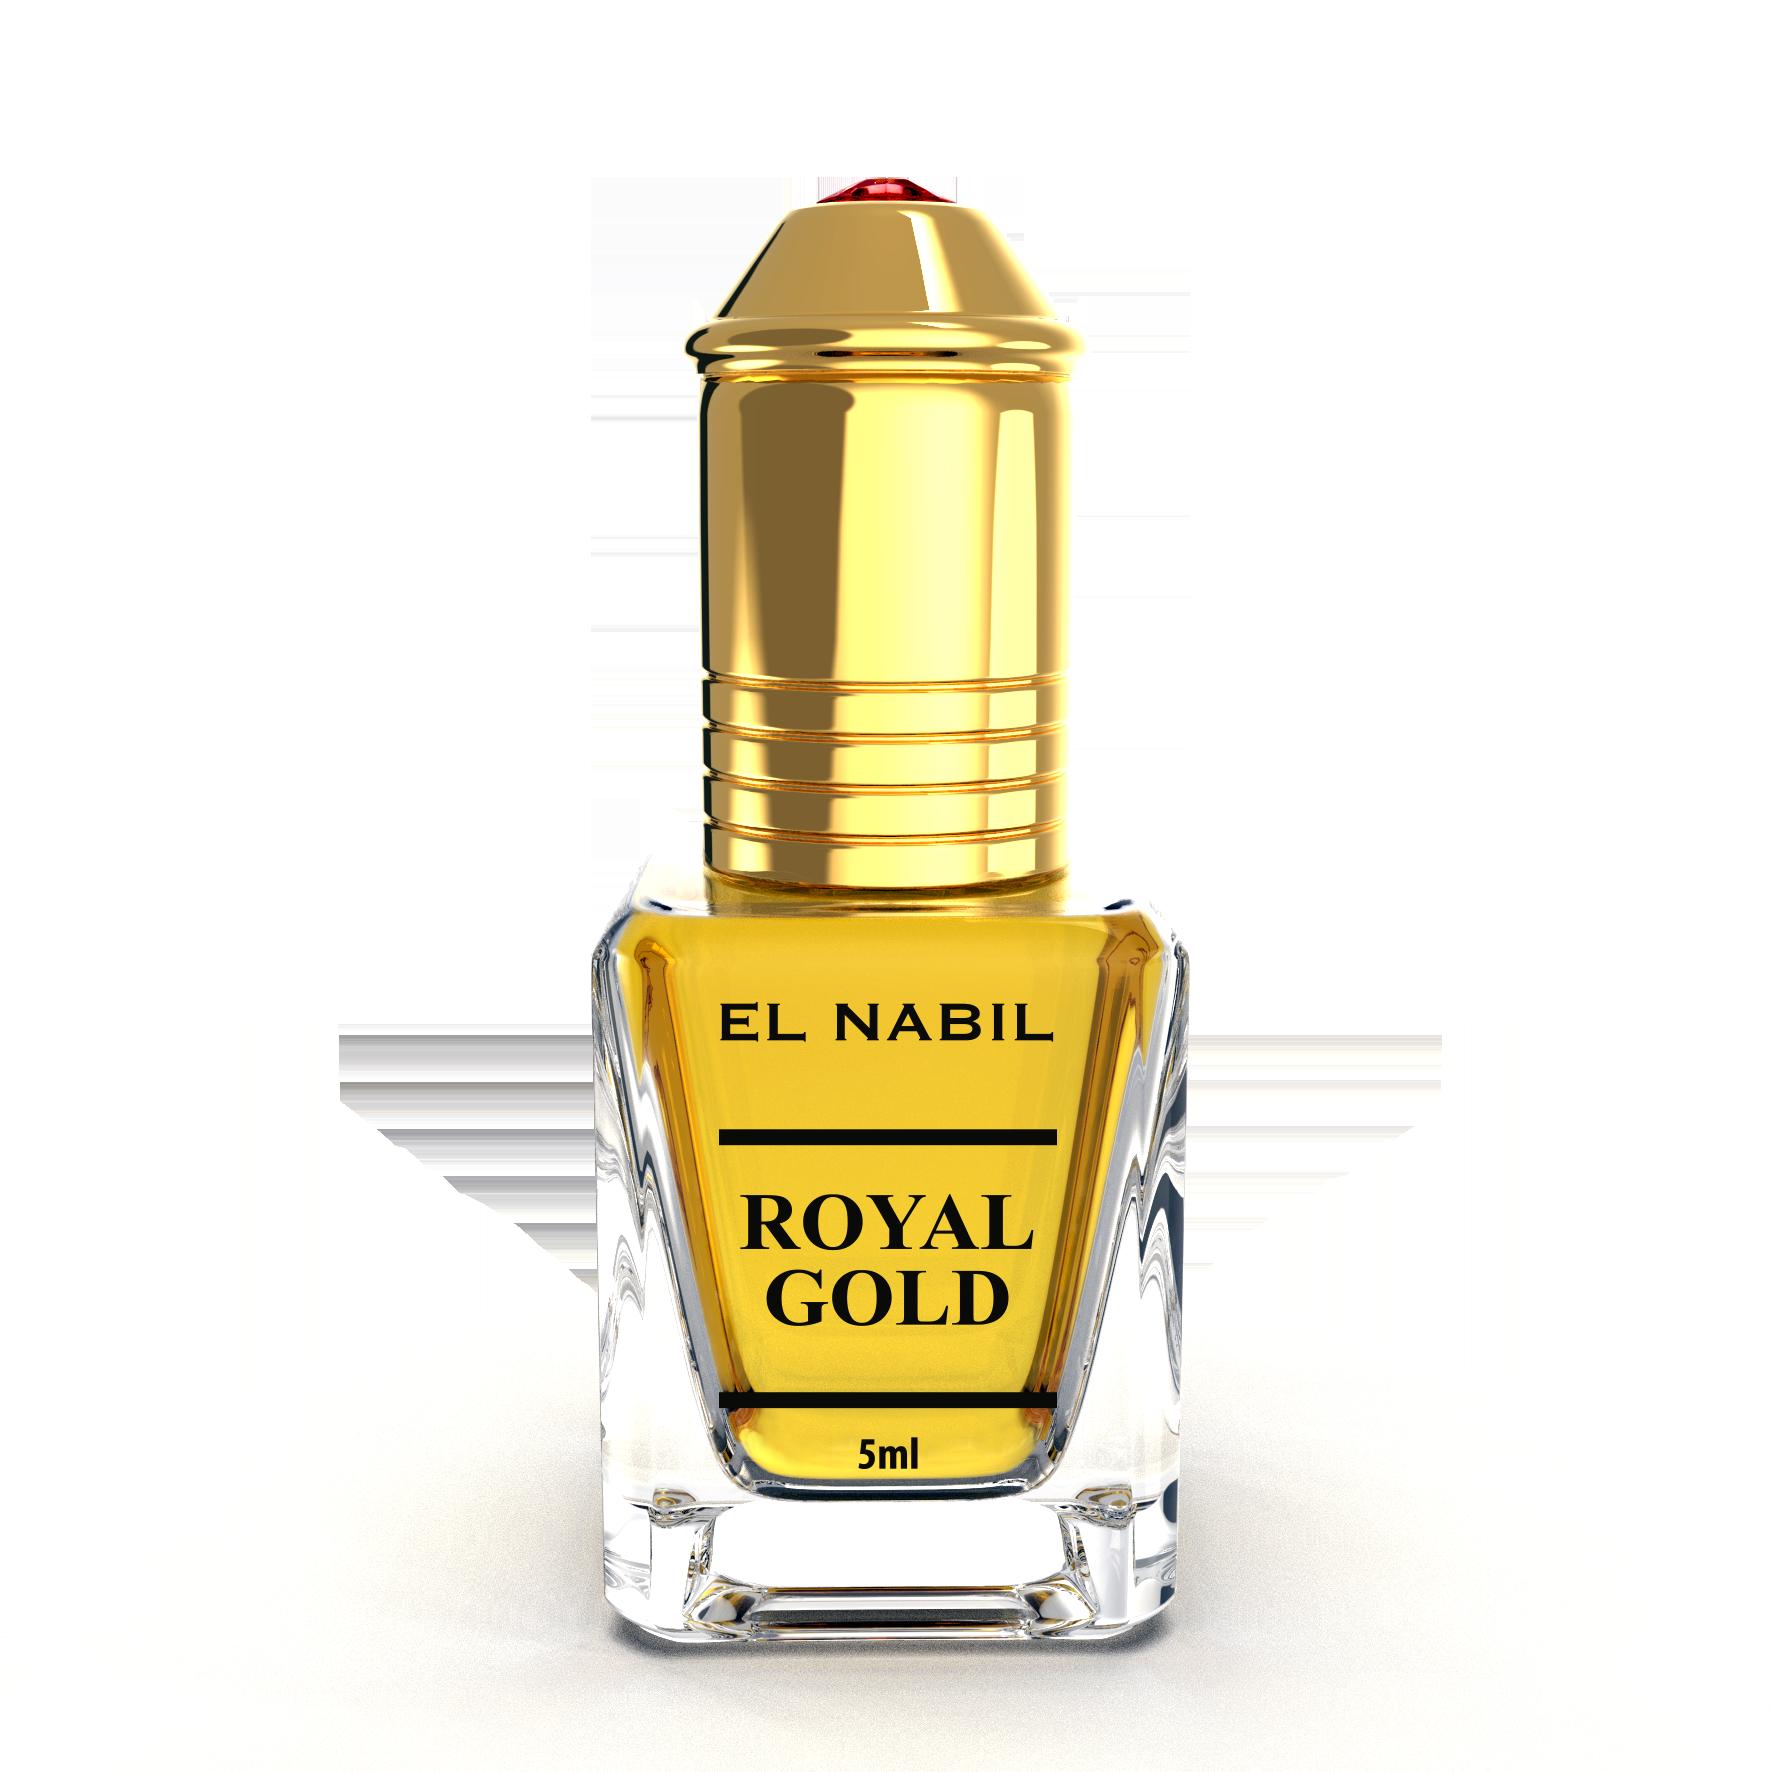 Royal Gold Parfum El nabil 5ml